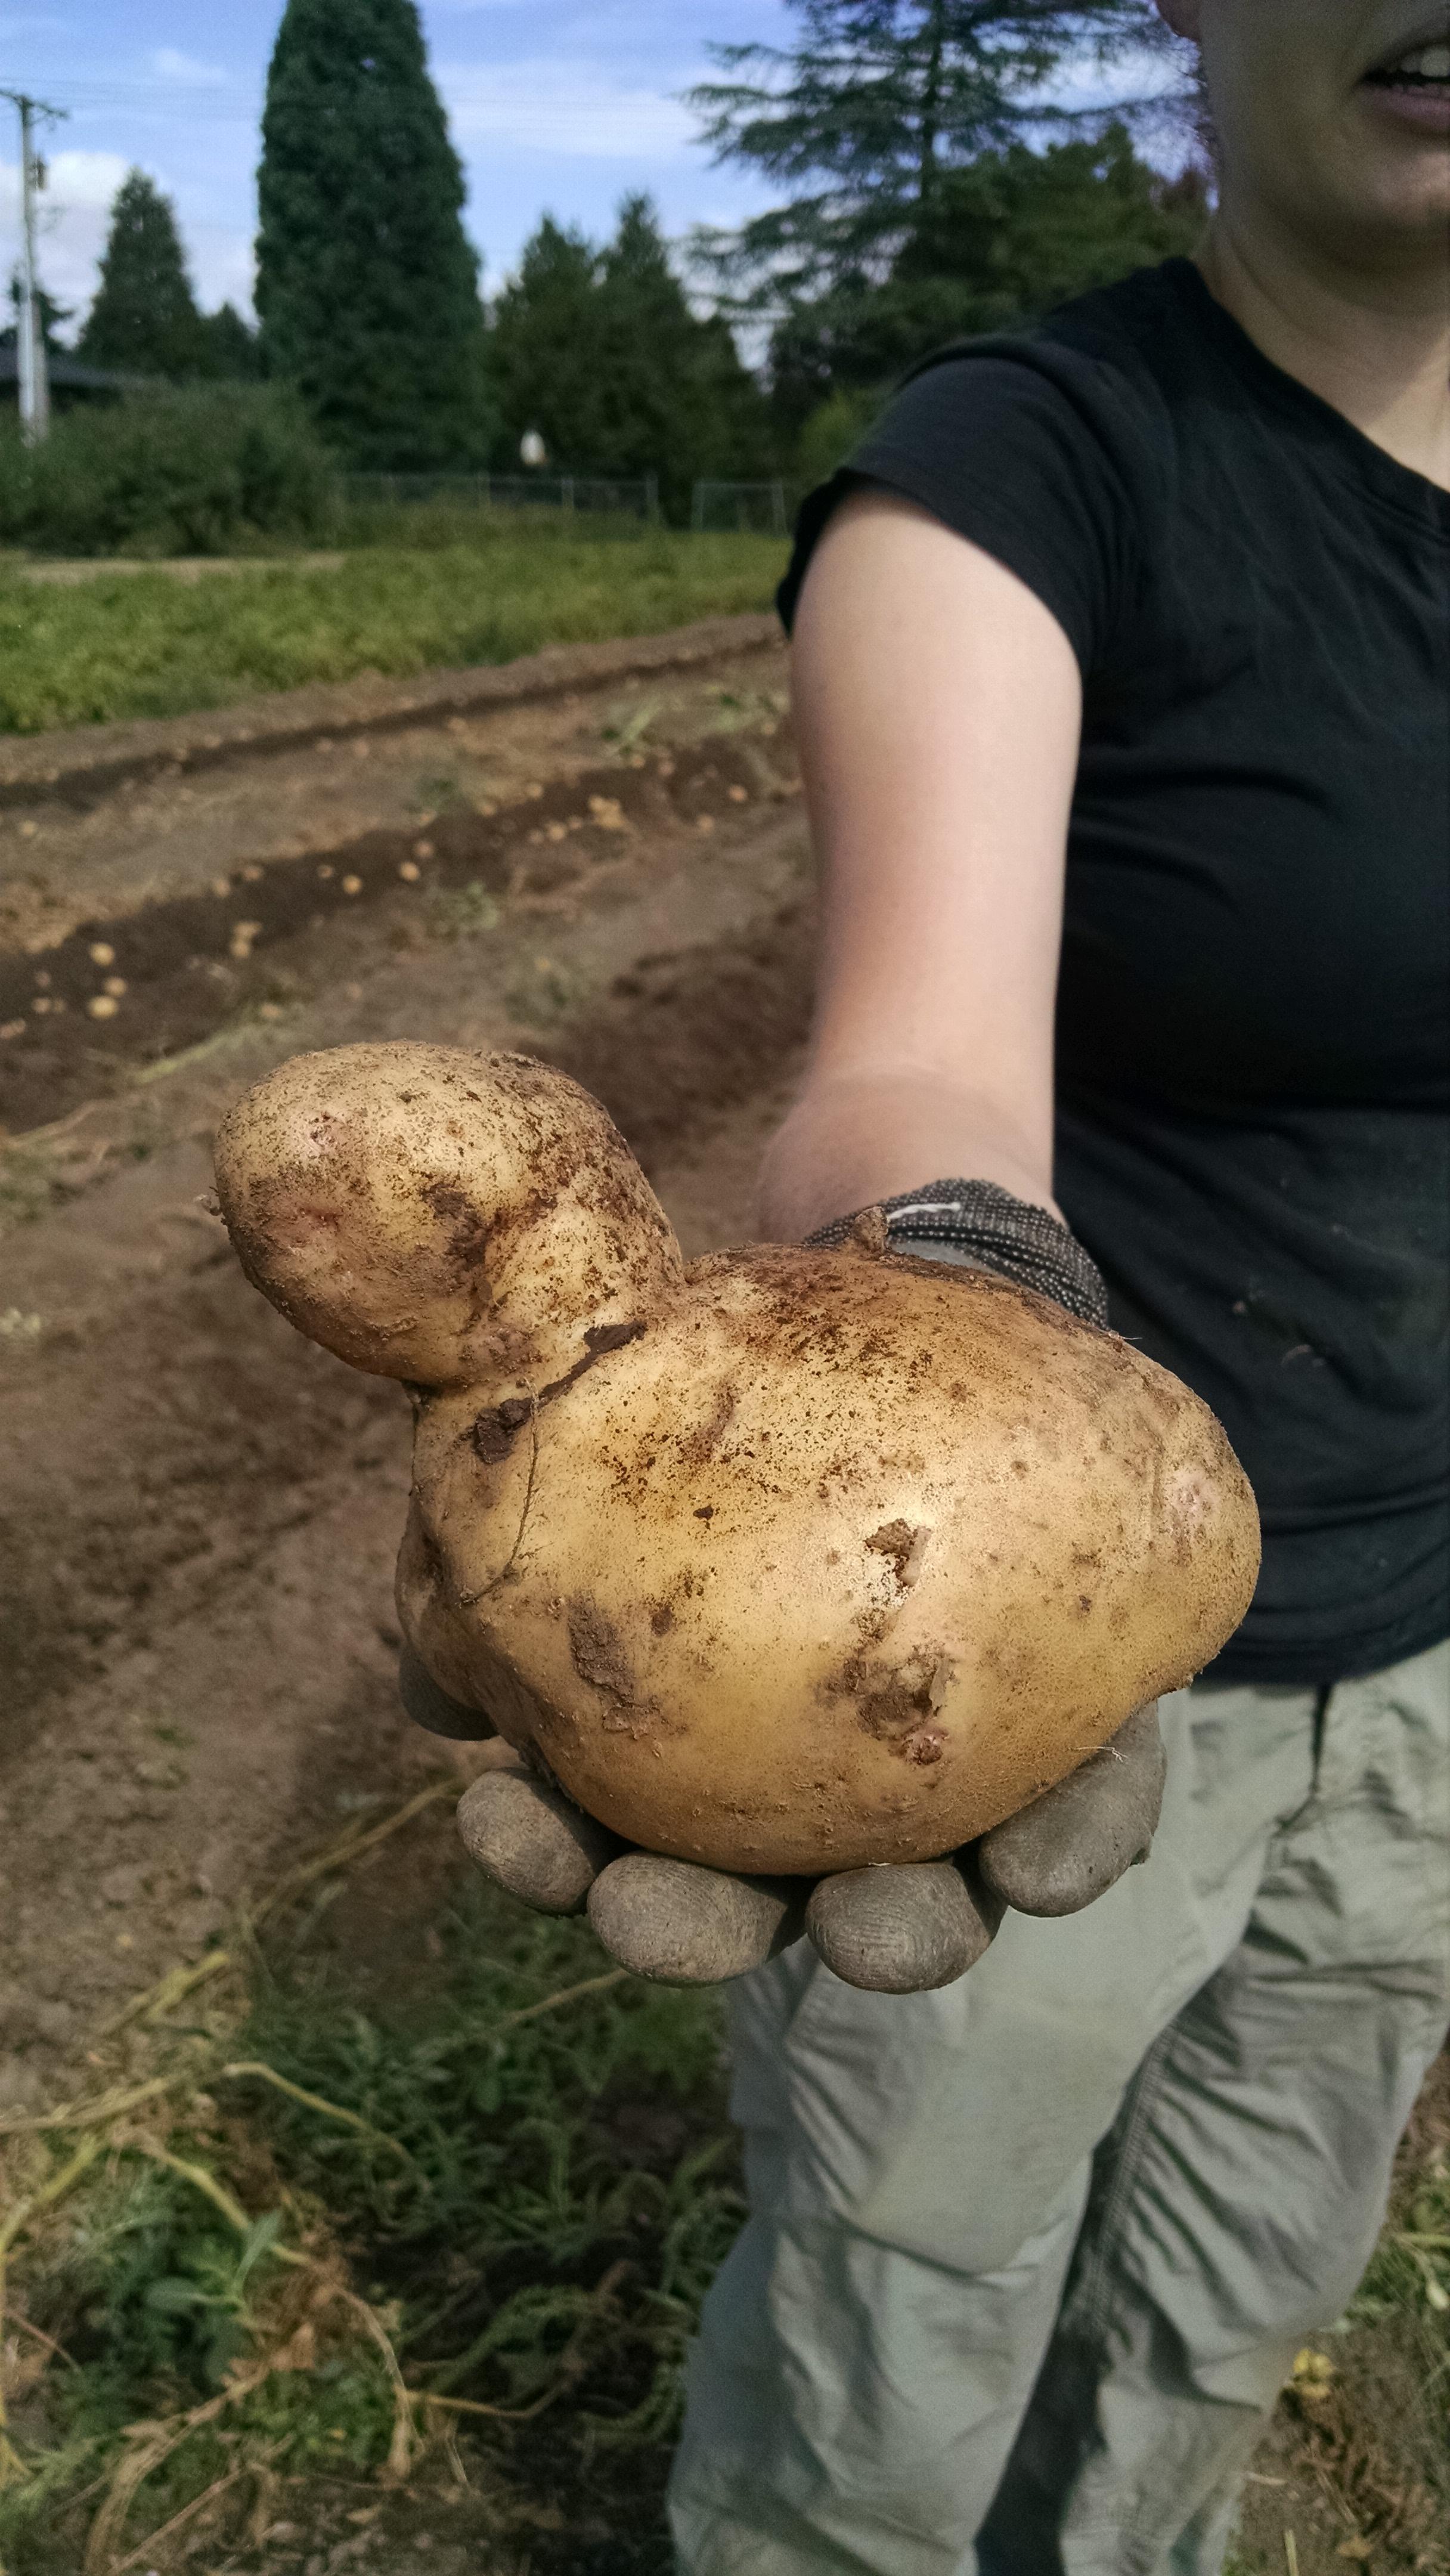 Rubber ducky Yukon Gold potato during the big harvest